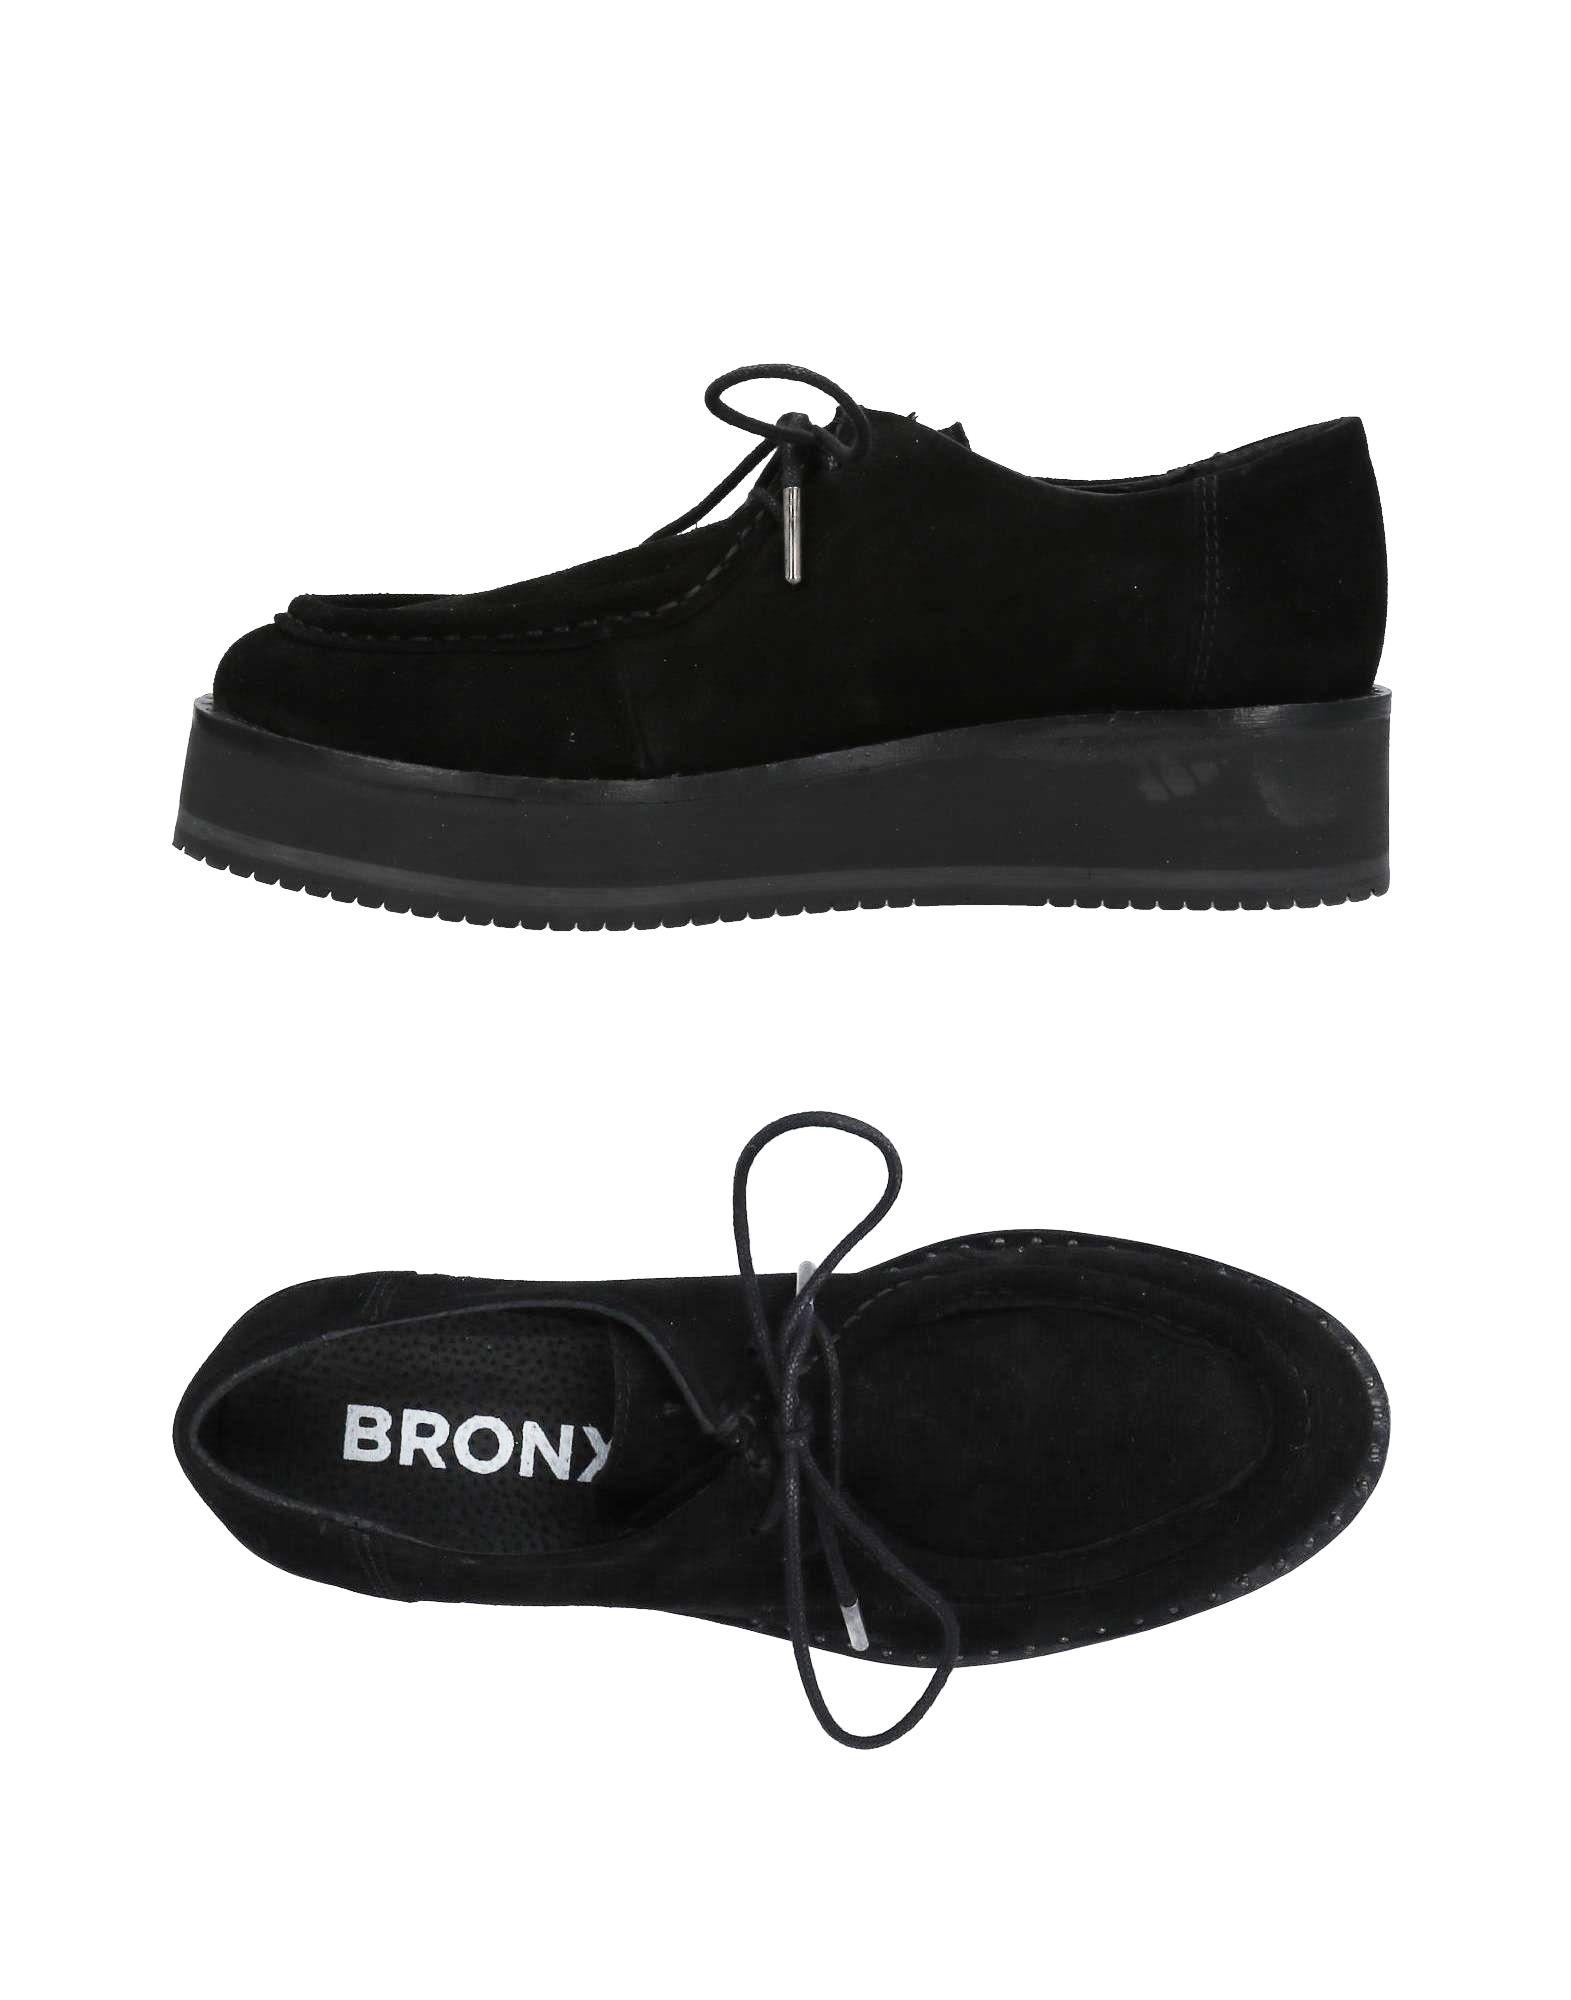 Bronx Schnürschuhe Damen  11454945PE Gute Qualität beliebte Schuhe